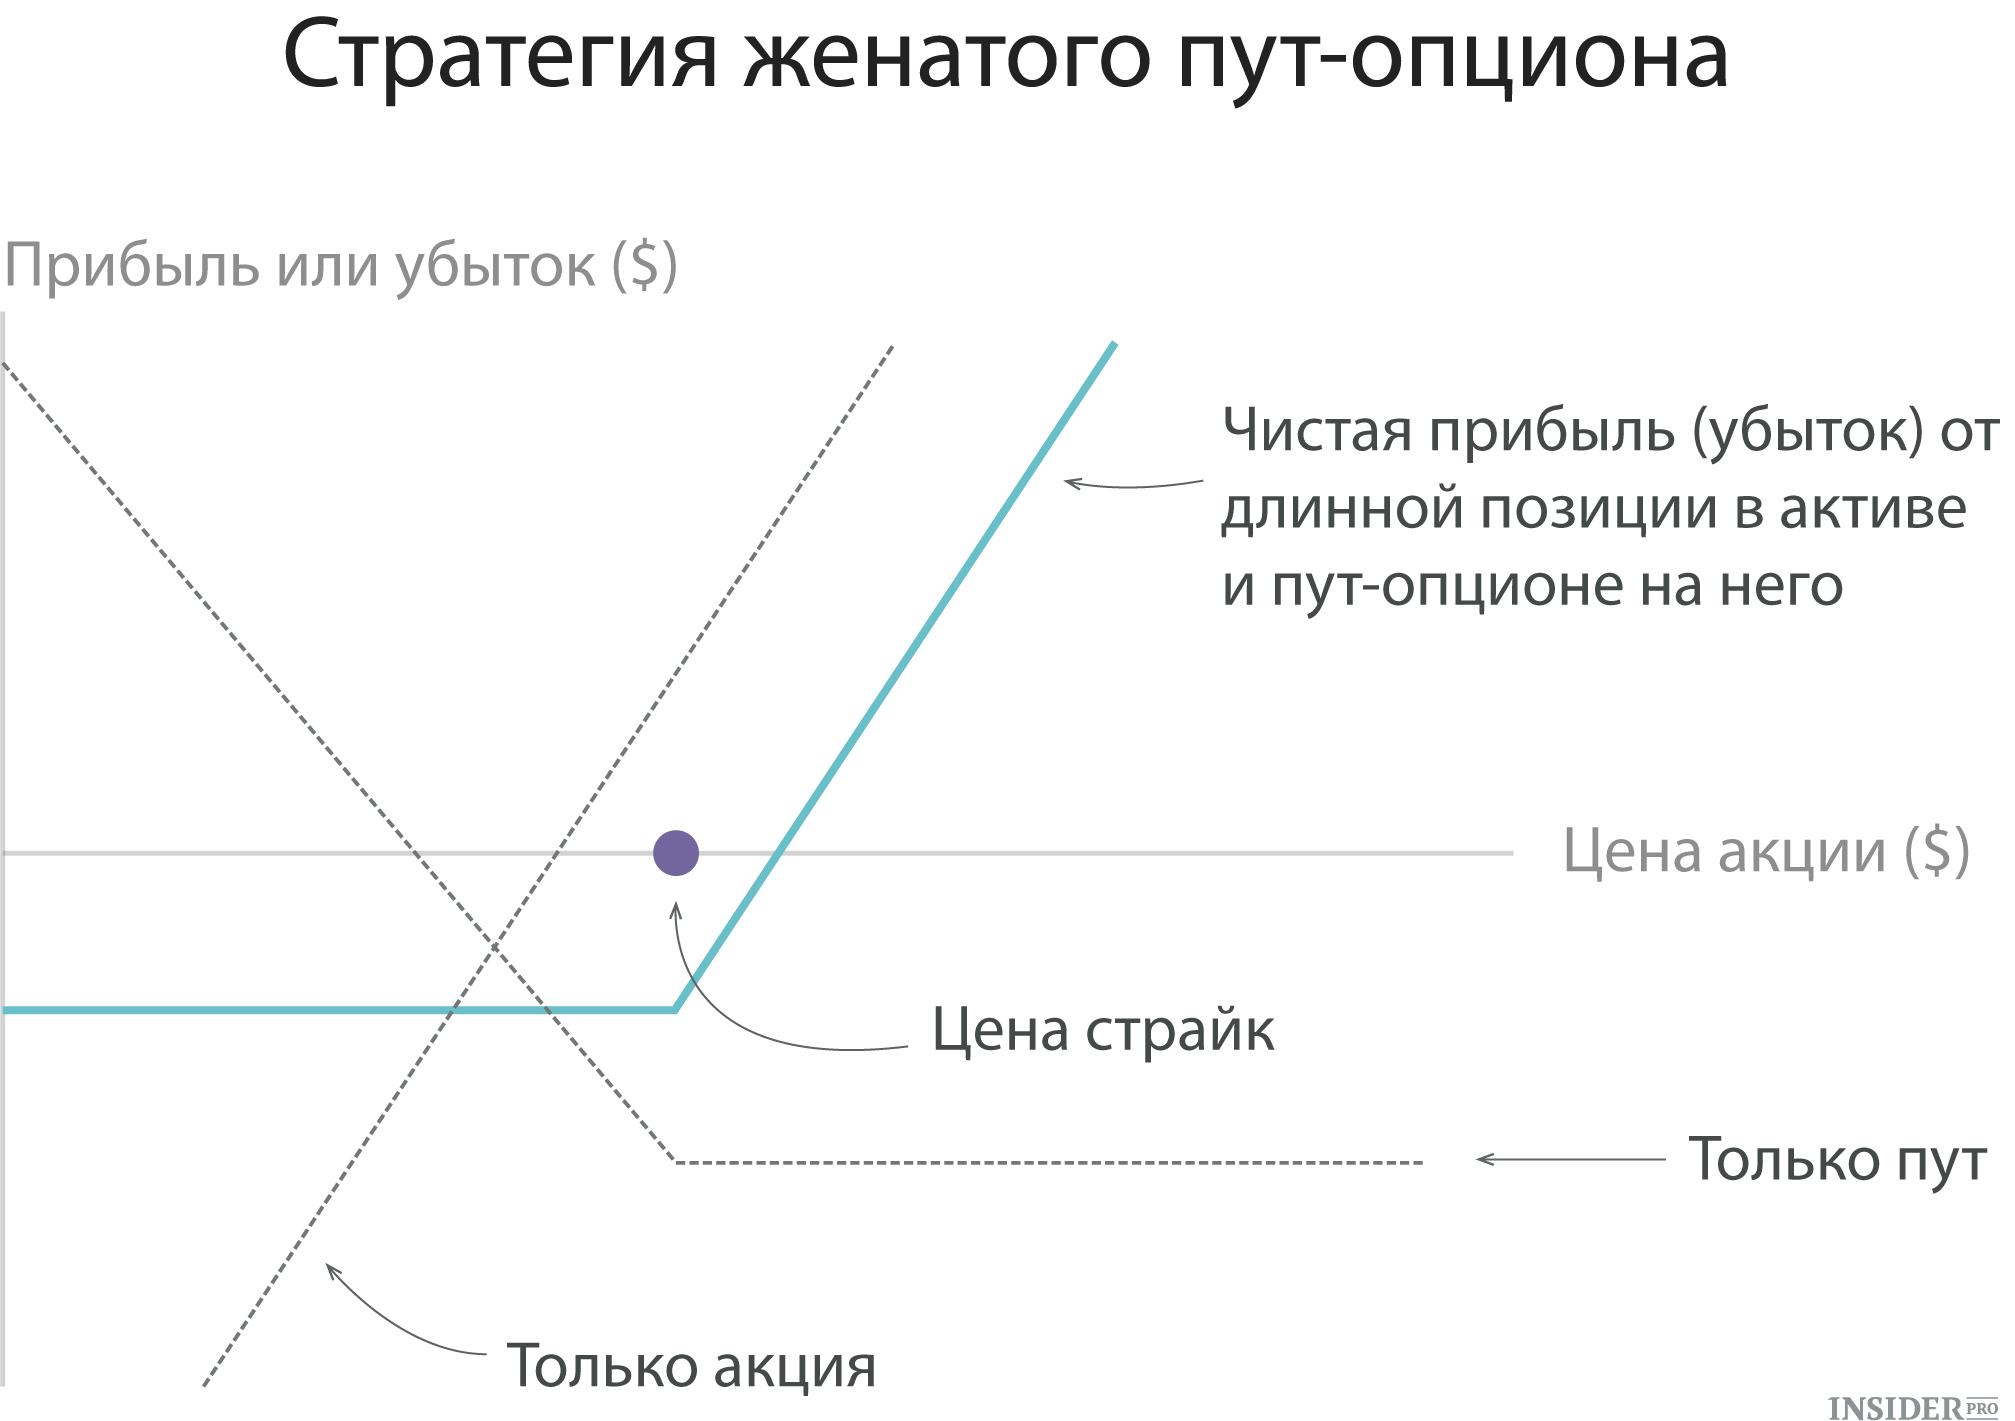 Apraksts — Renesource Capital